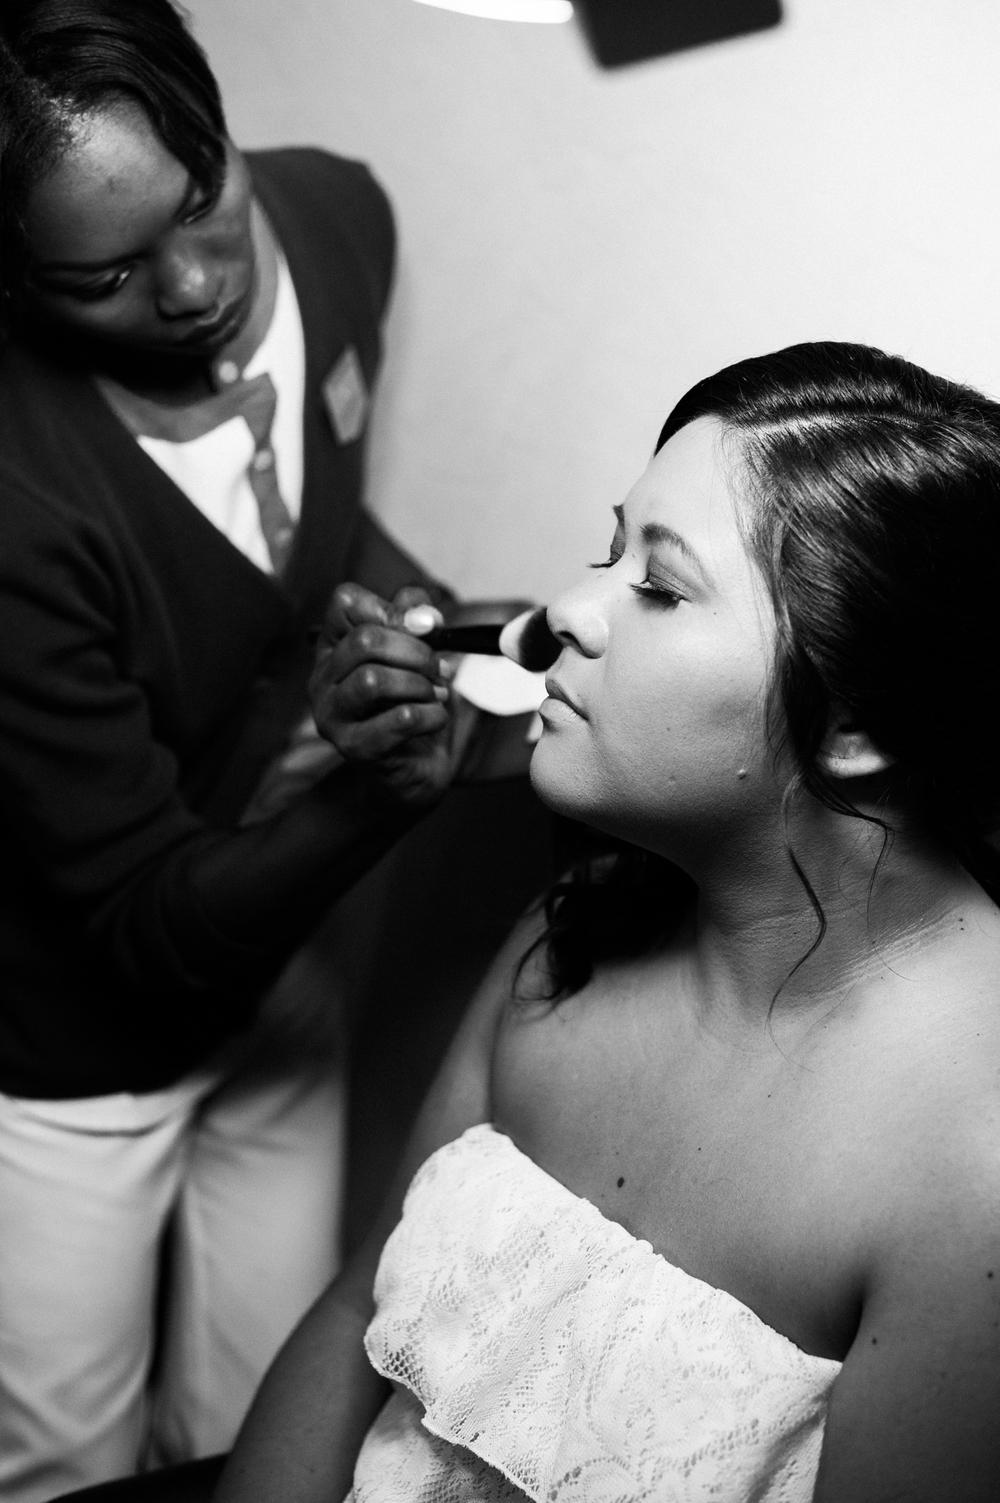 JadeandRyan-Montego-Bay-Jamaica-Wedding-Iberostar-Resort-Beach-4.jpg